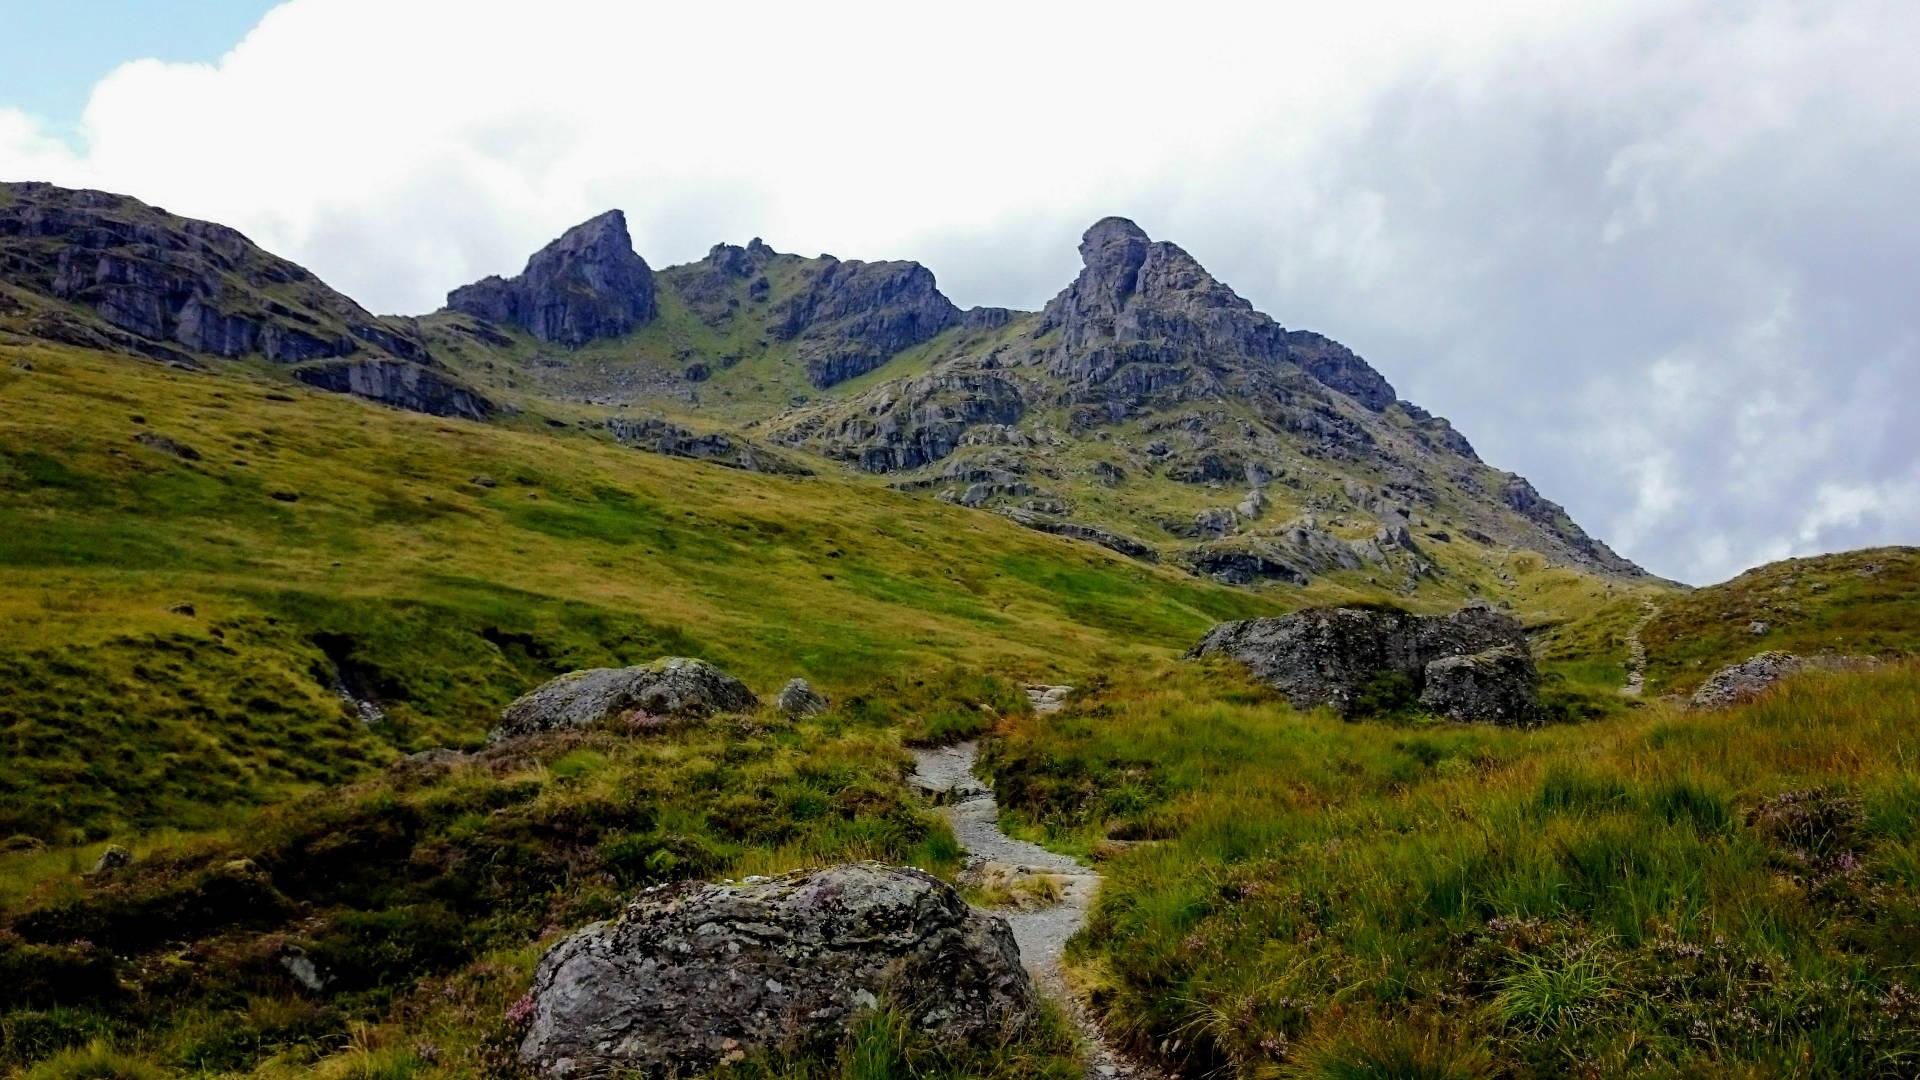 Cesta na vrchol Ben Arthur